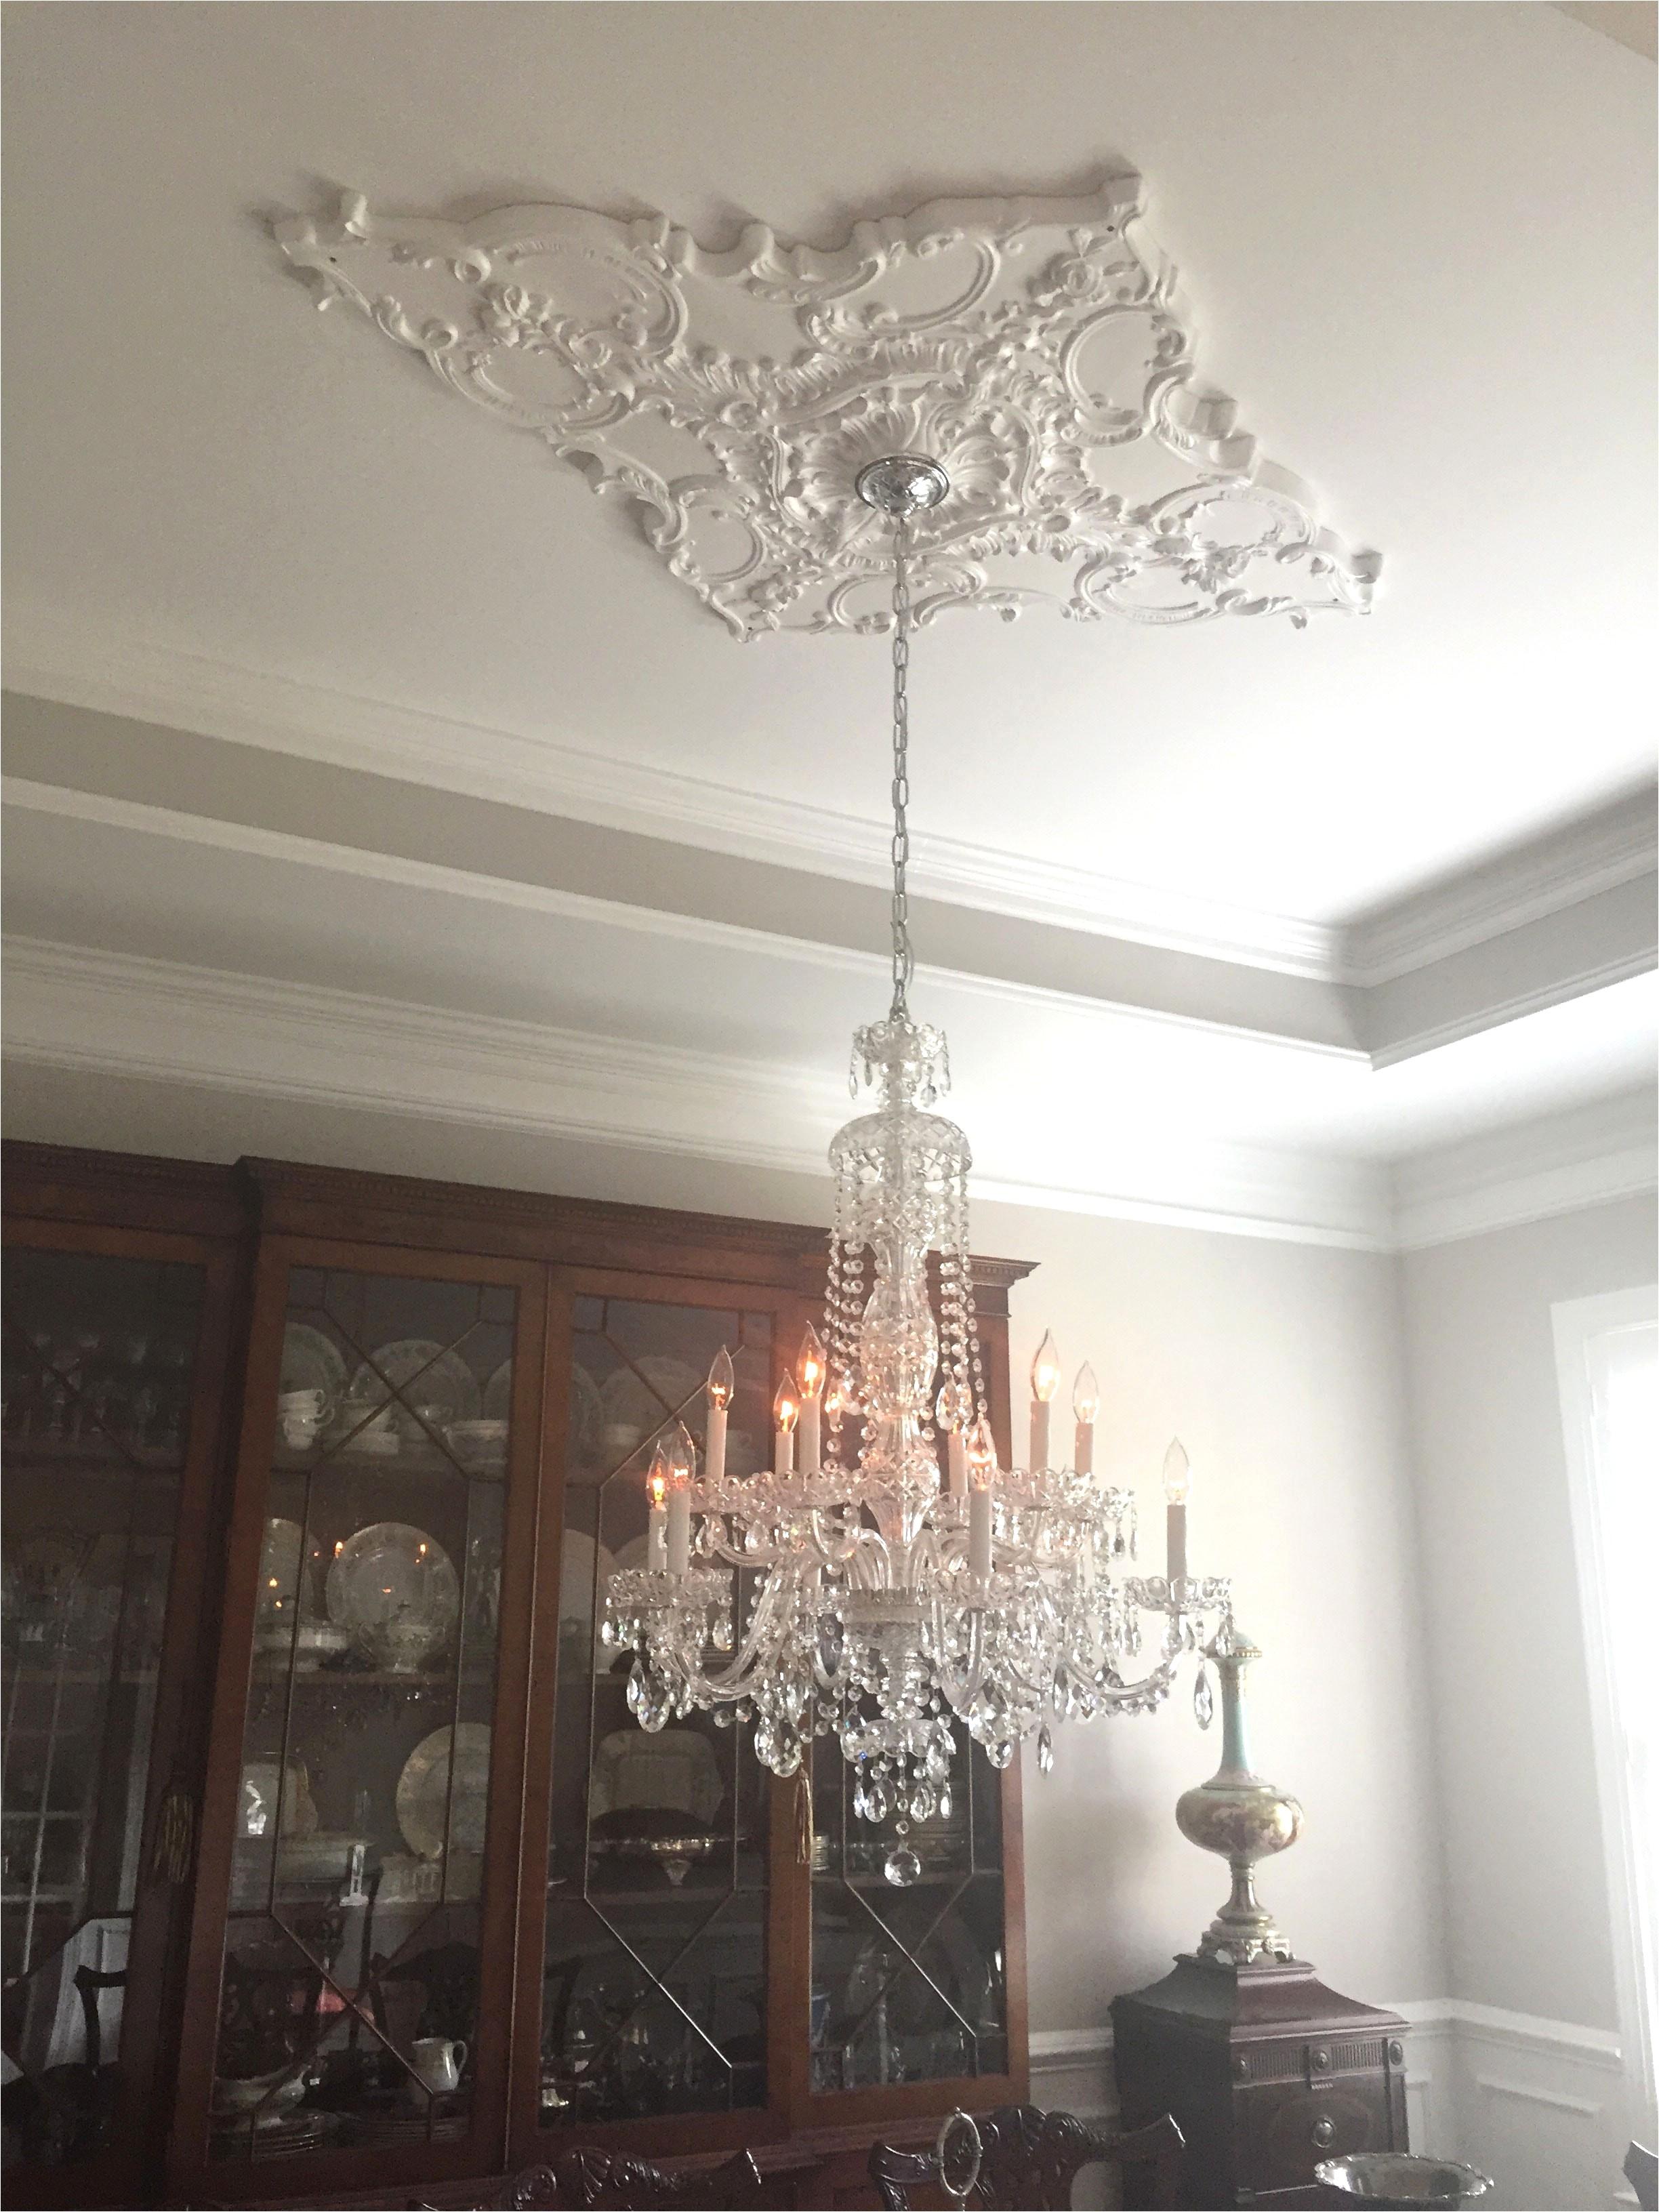 Awesome Led Light Design for Homes